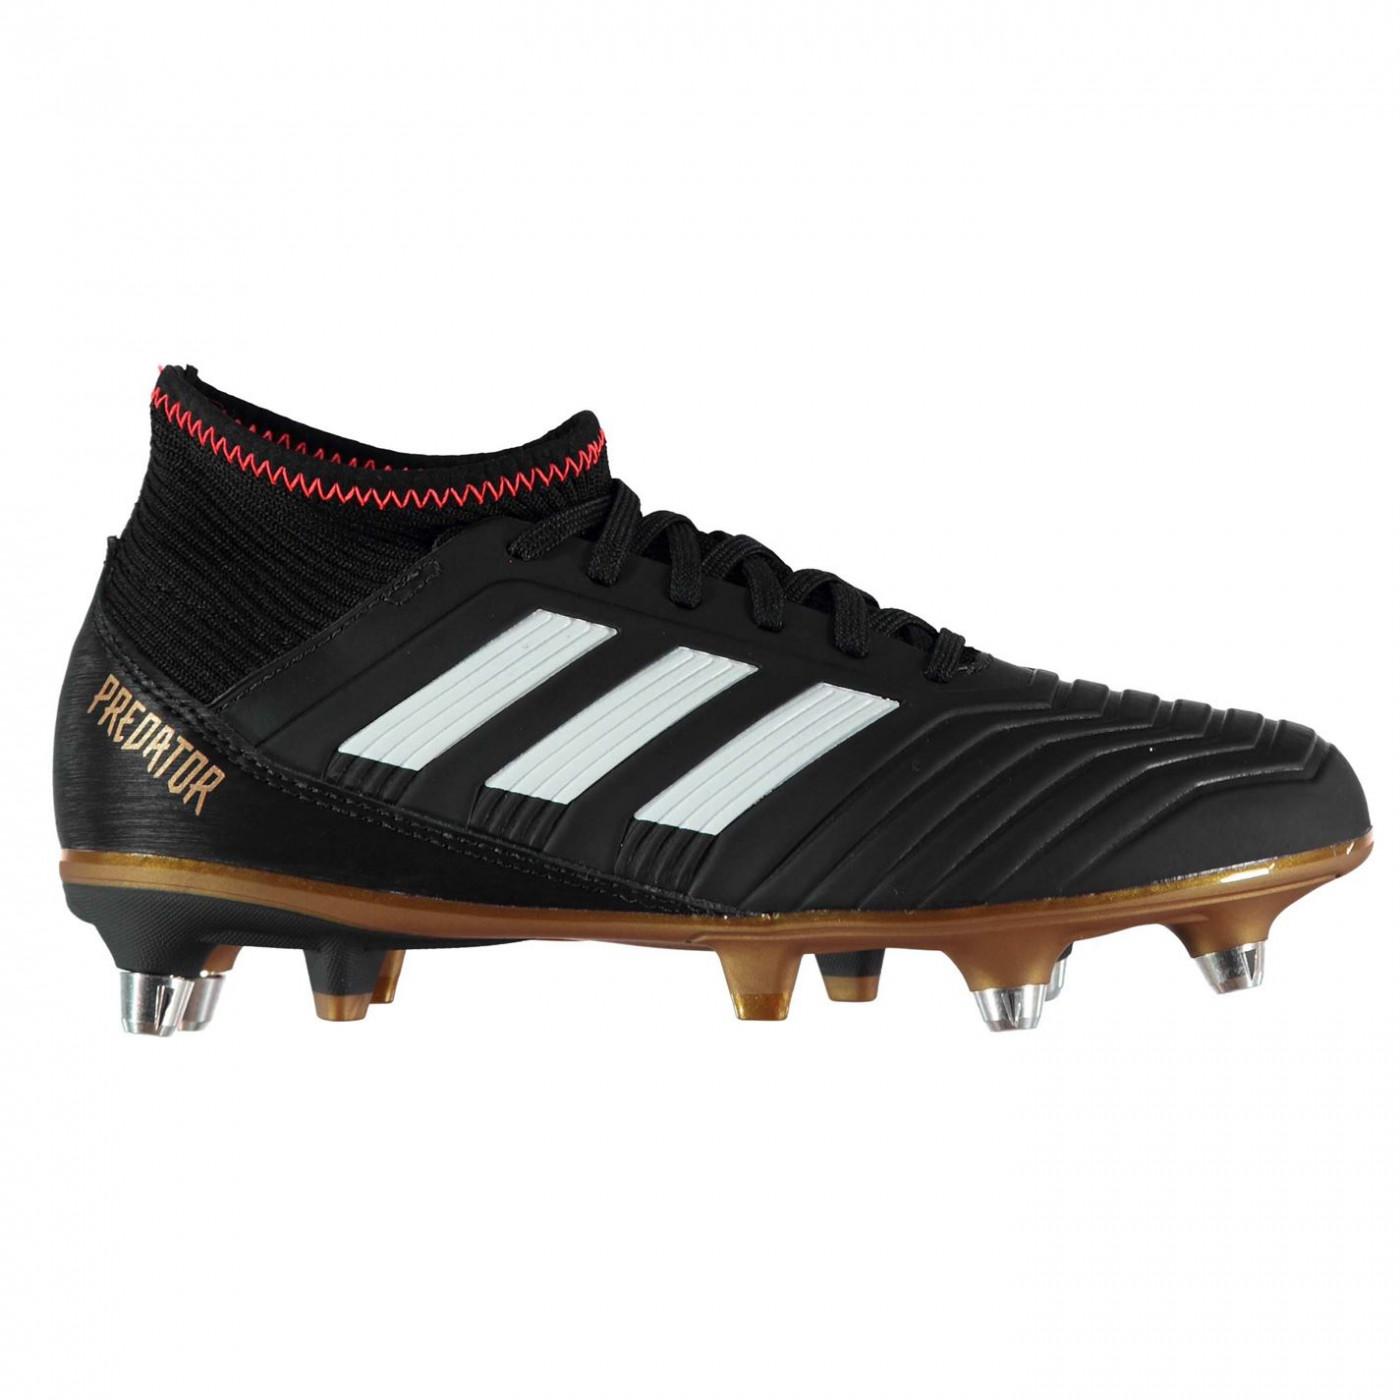 e07c558010764 Adidas Predator 18.3 Junior SG Football Boots - FACTCOOL